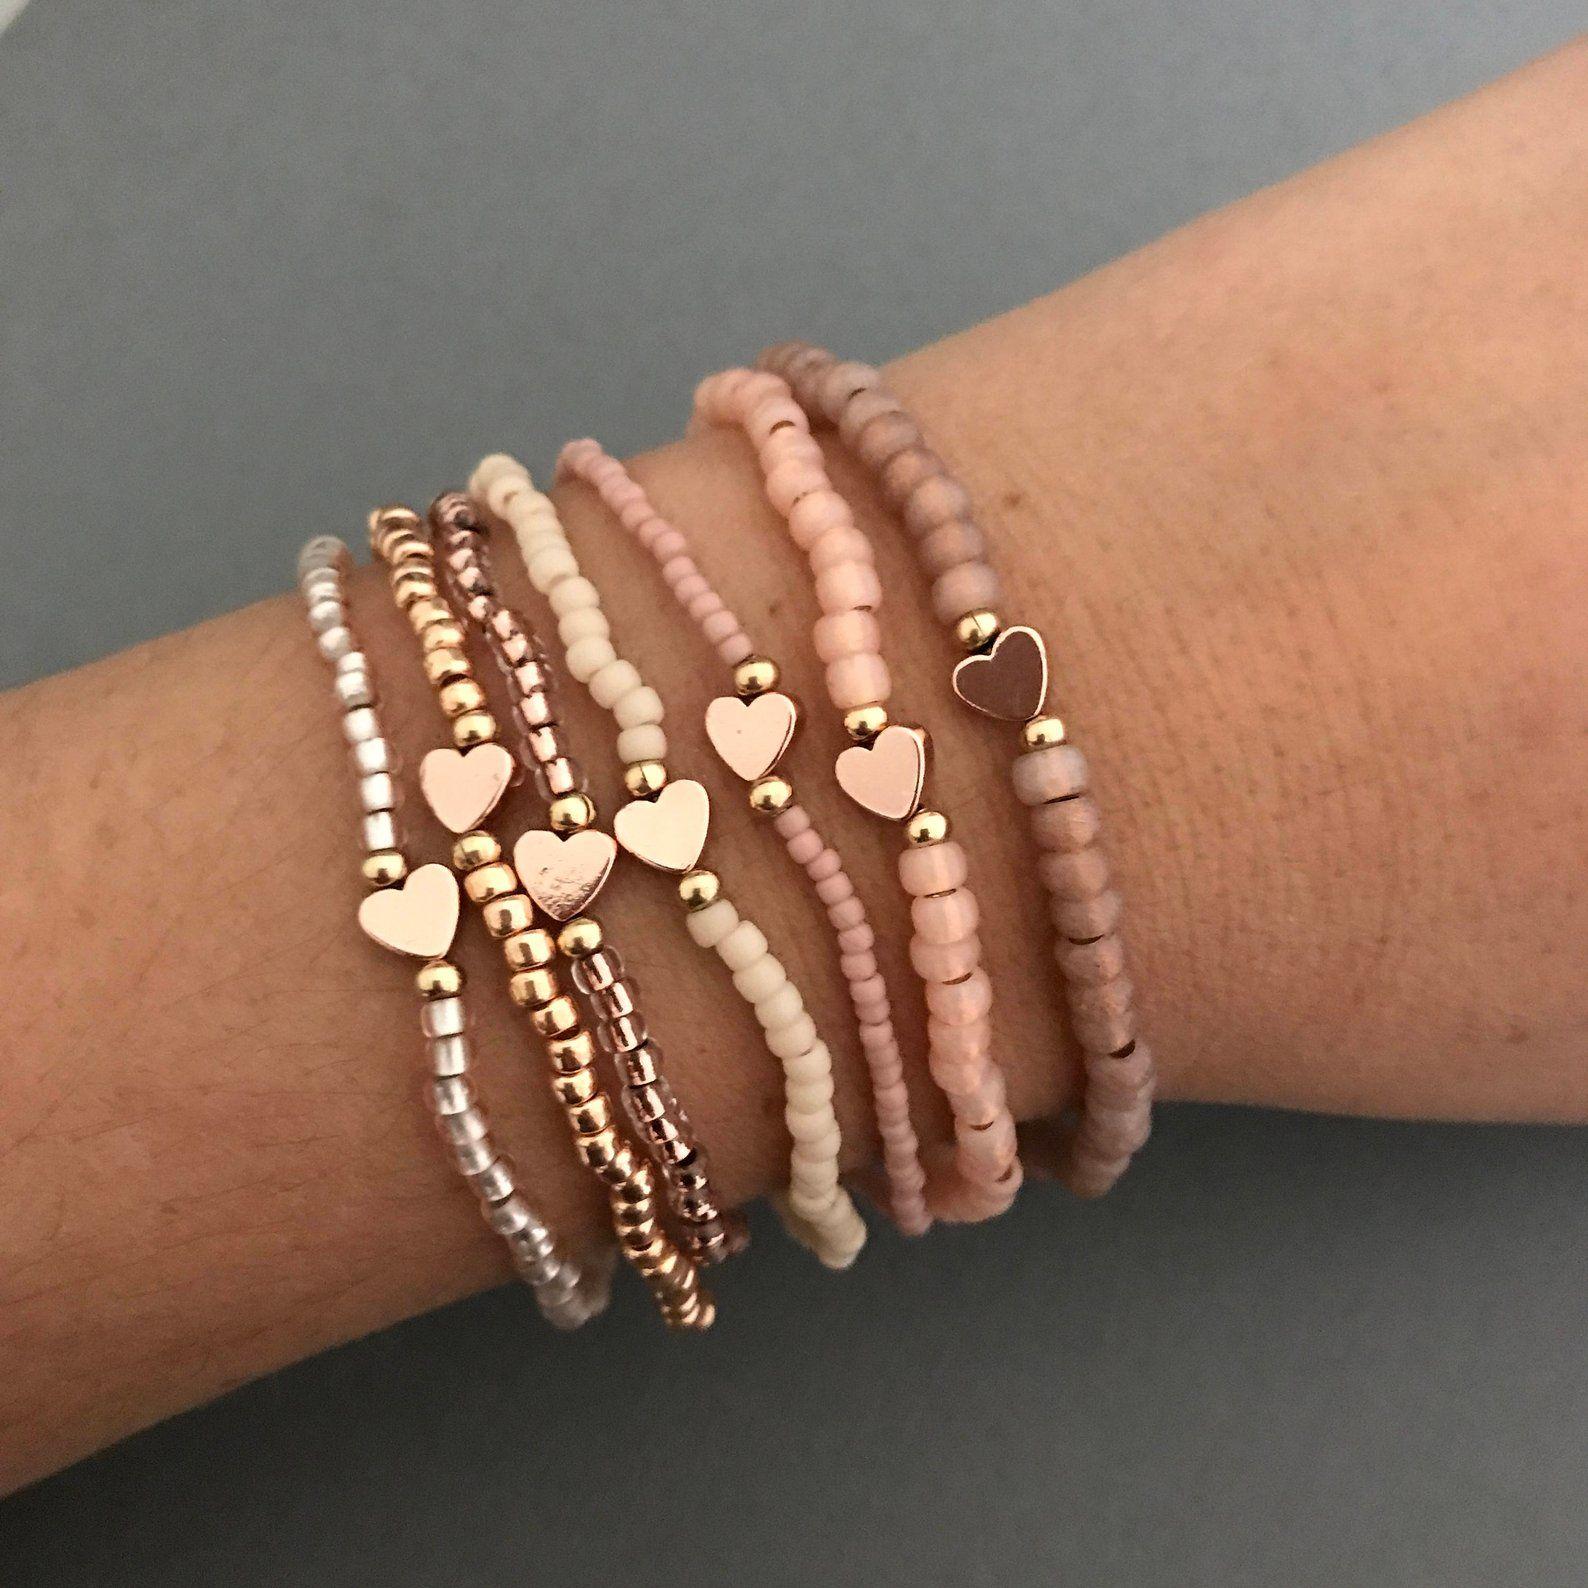 Blush Minimal Heart Bracelets – Best Friend Gift – 90s Friendship Bracelet – Seed Bead Stacking Bracelets – Blush Tiny Heart Bracelet Set